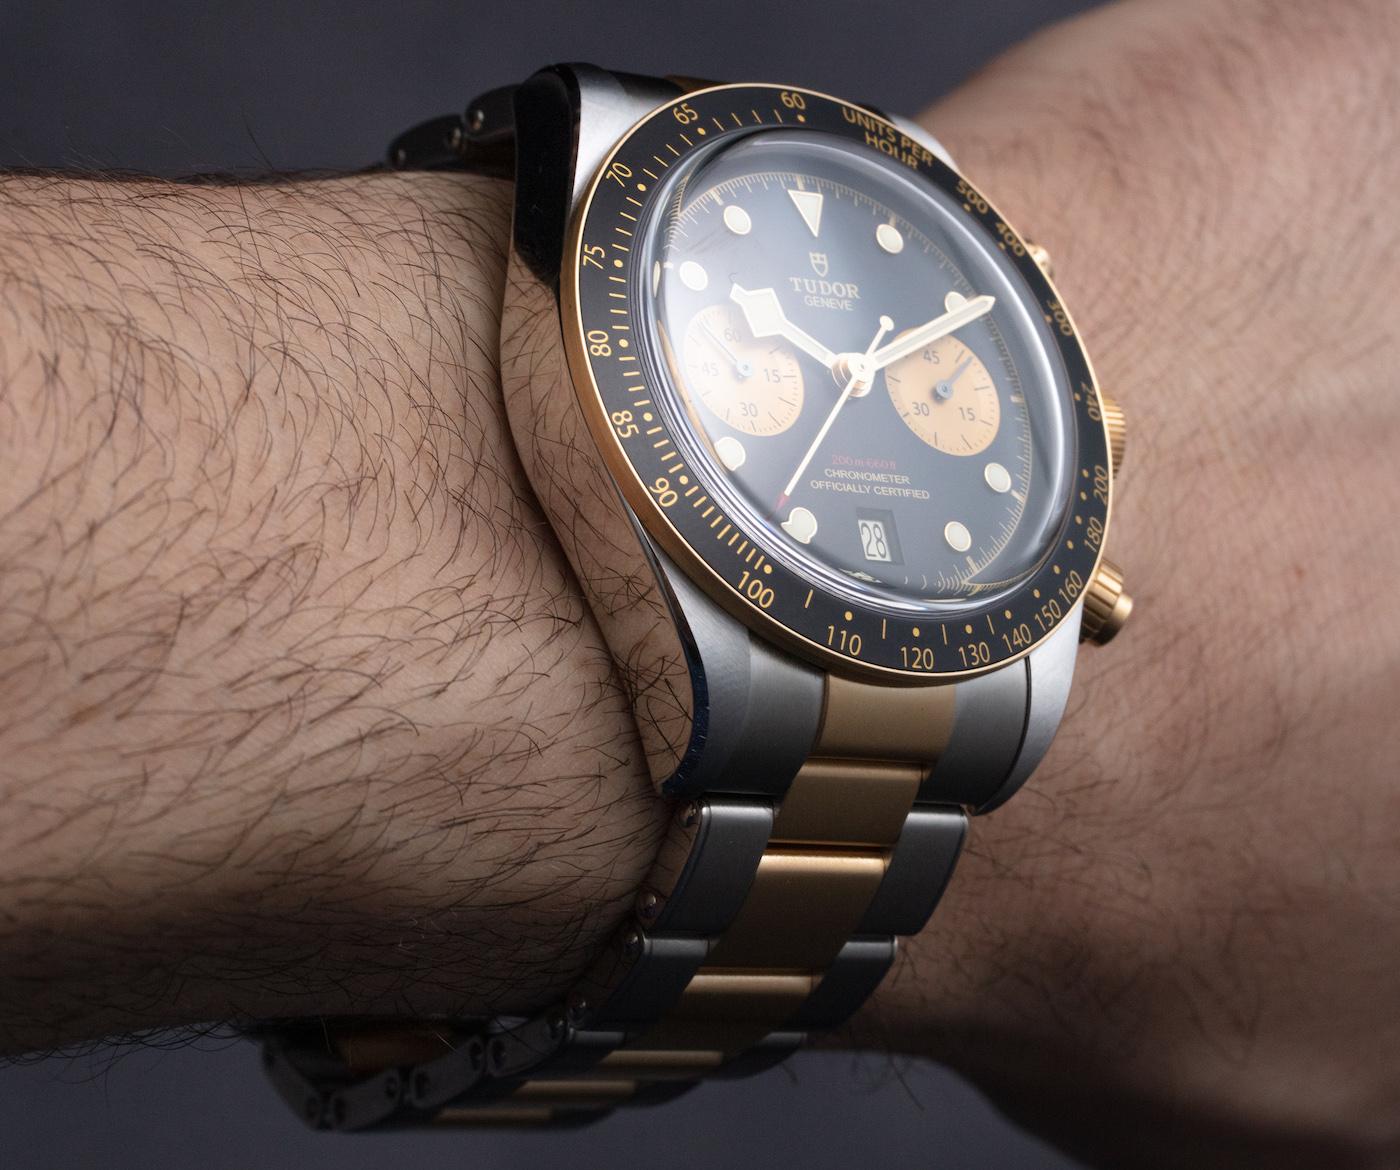 Tudor Black Bay Chrono S&G 金鋼腕表評測 | aBlogtoWatch